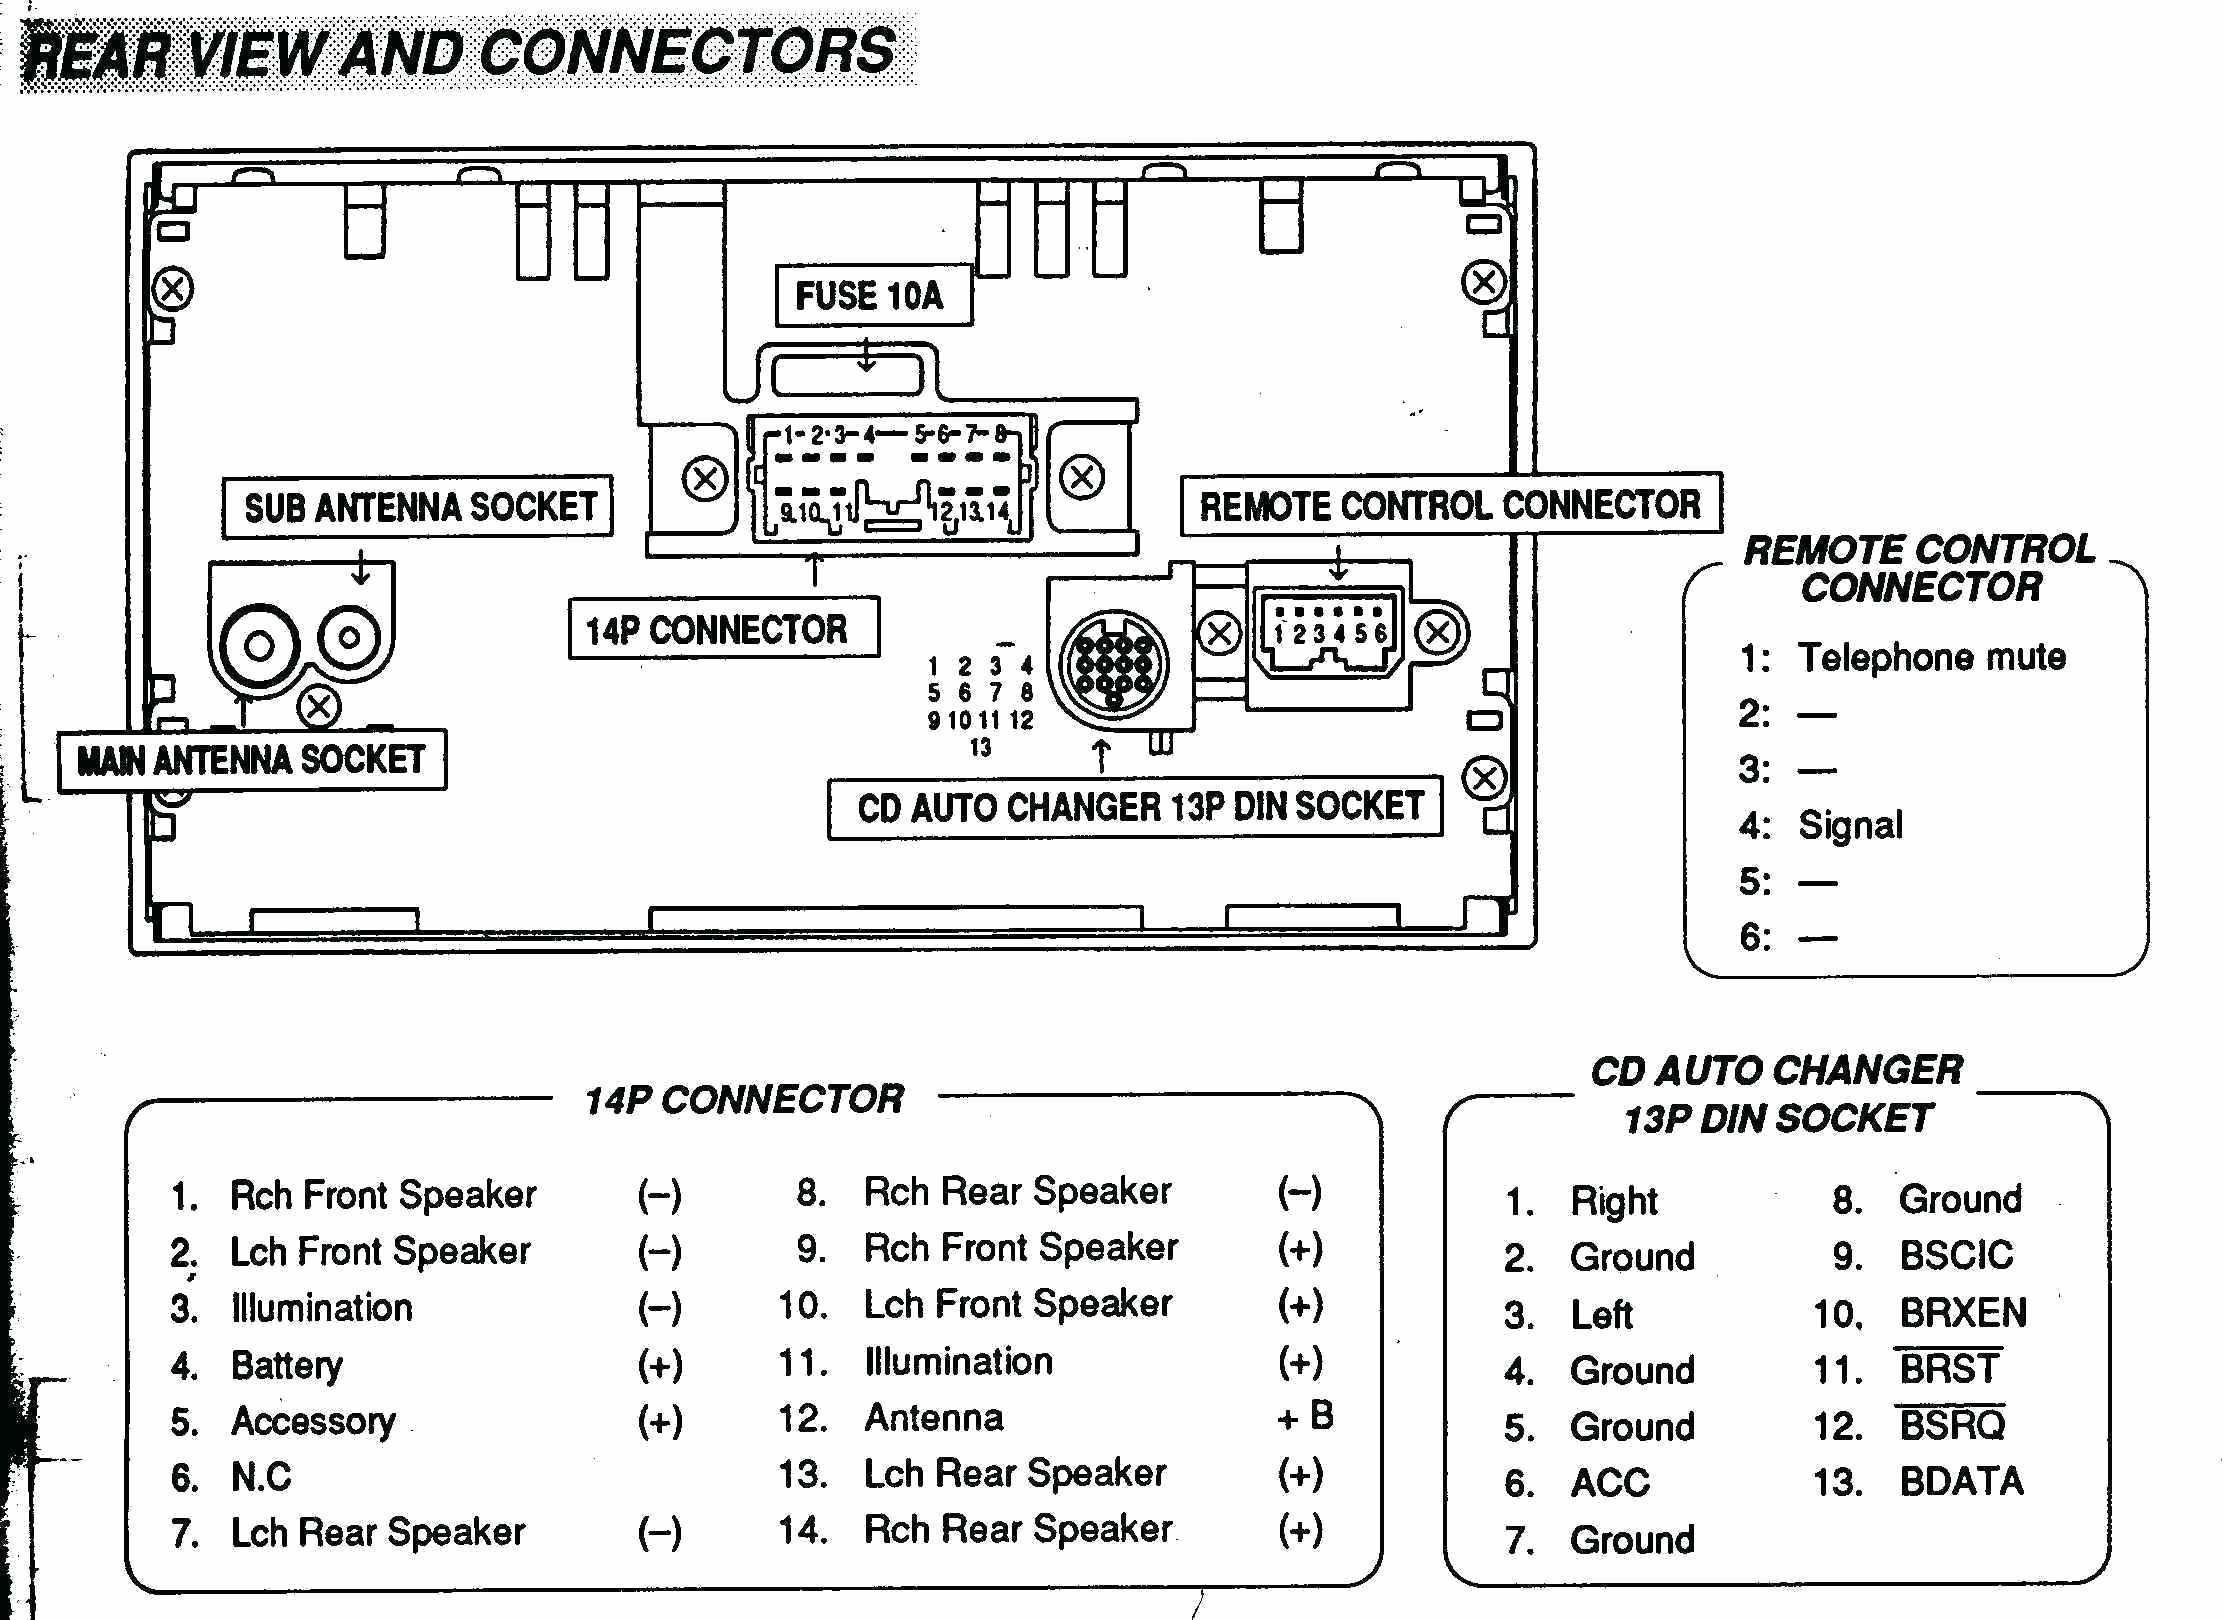 fujitsu ten limited radio wiring diagram inspirational perfect holiday rambler wiring diagram adornment best for of fujitsu ten limited radio wiring diagram